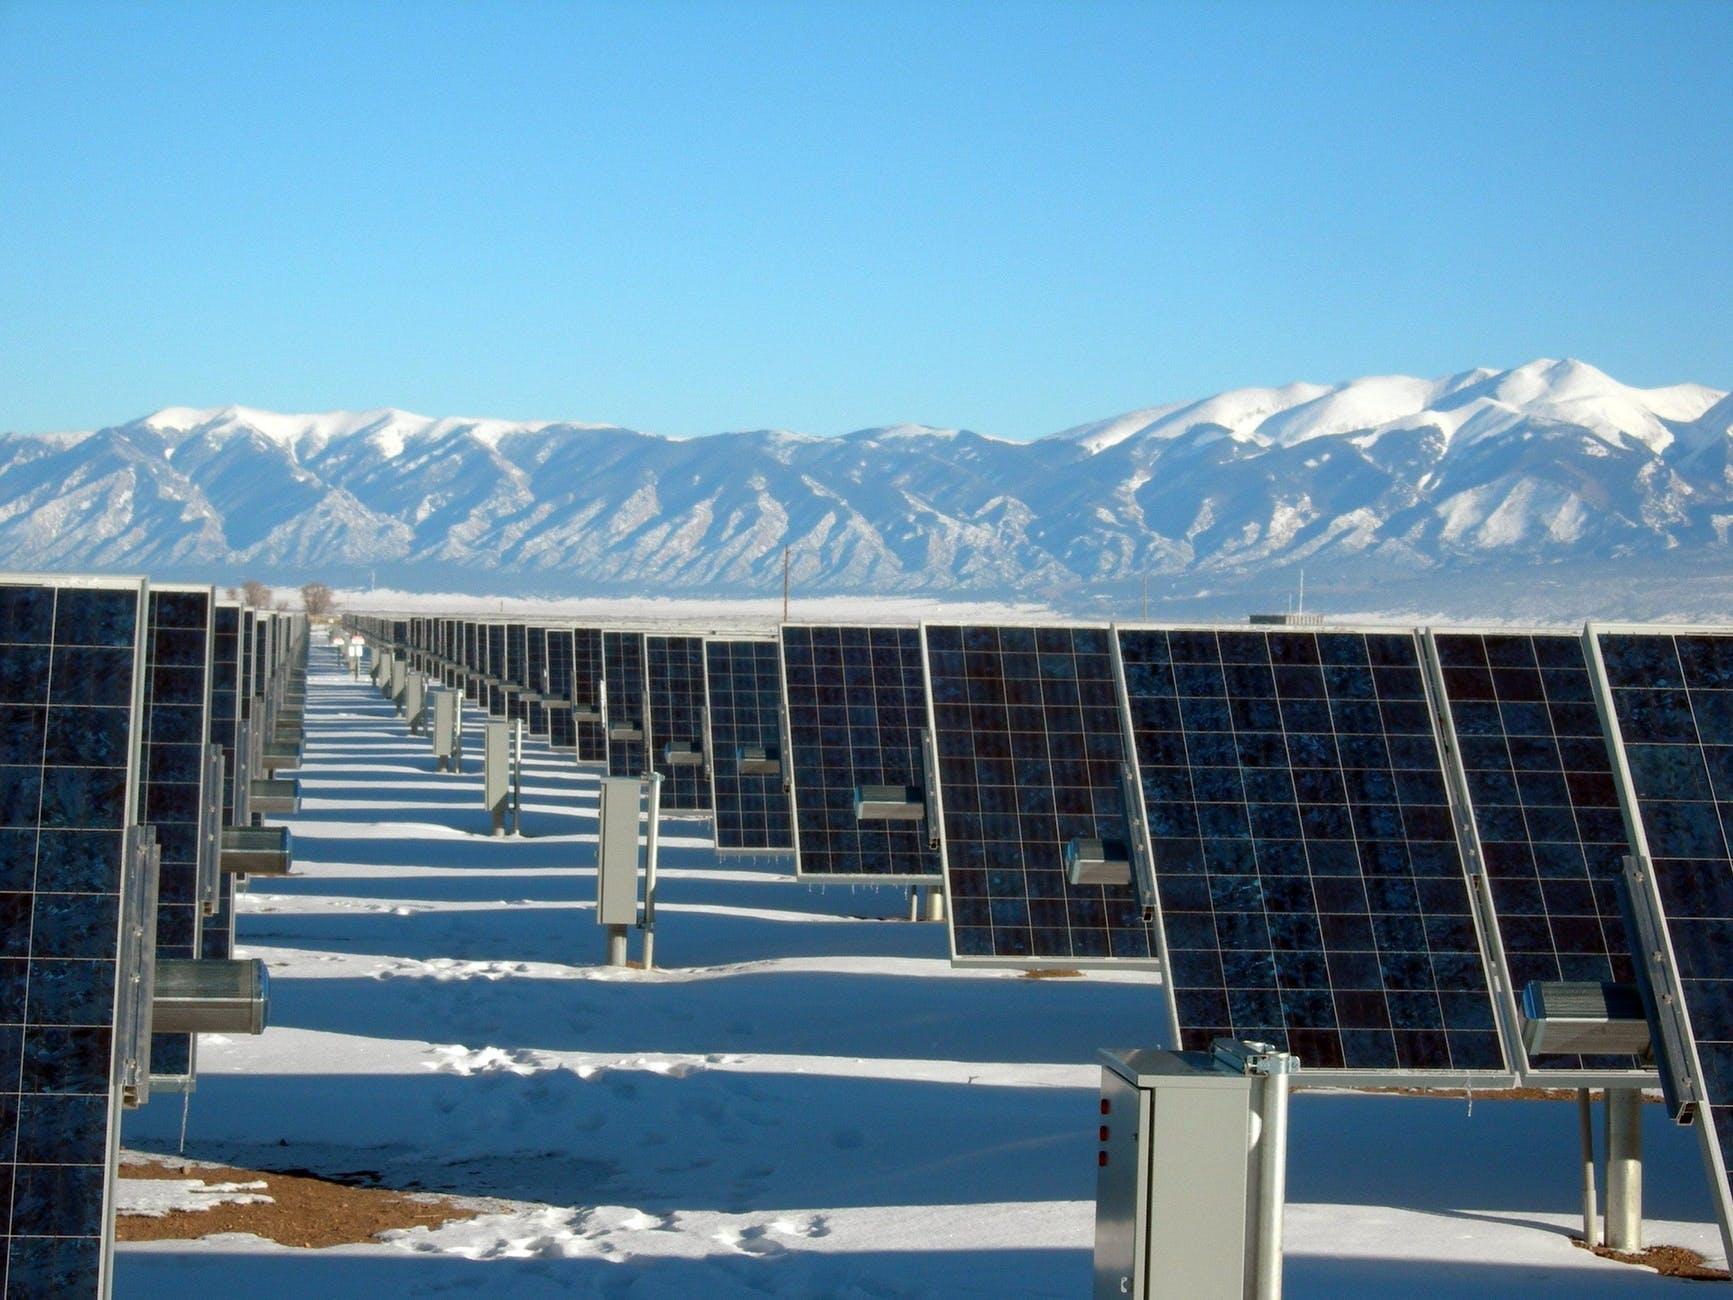 solar-panel-array-power-plant-electricity-power-159160.jpeg